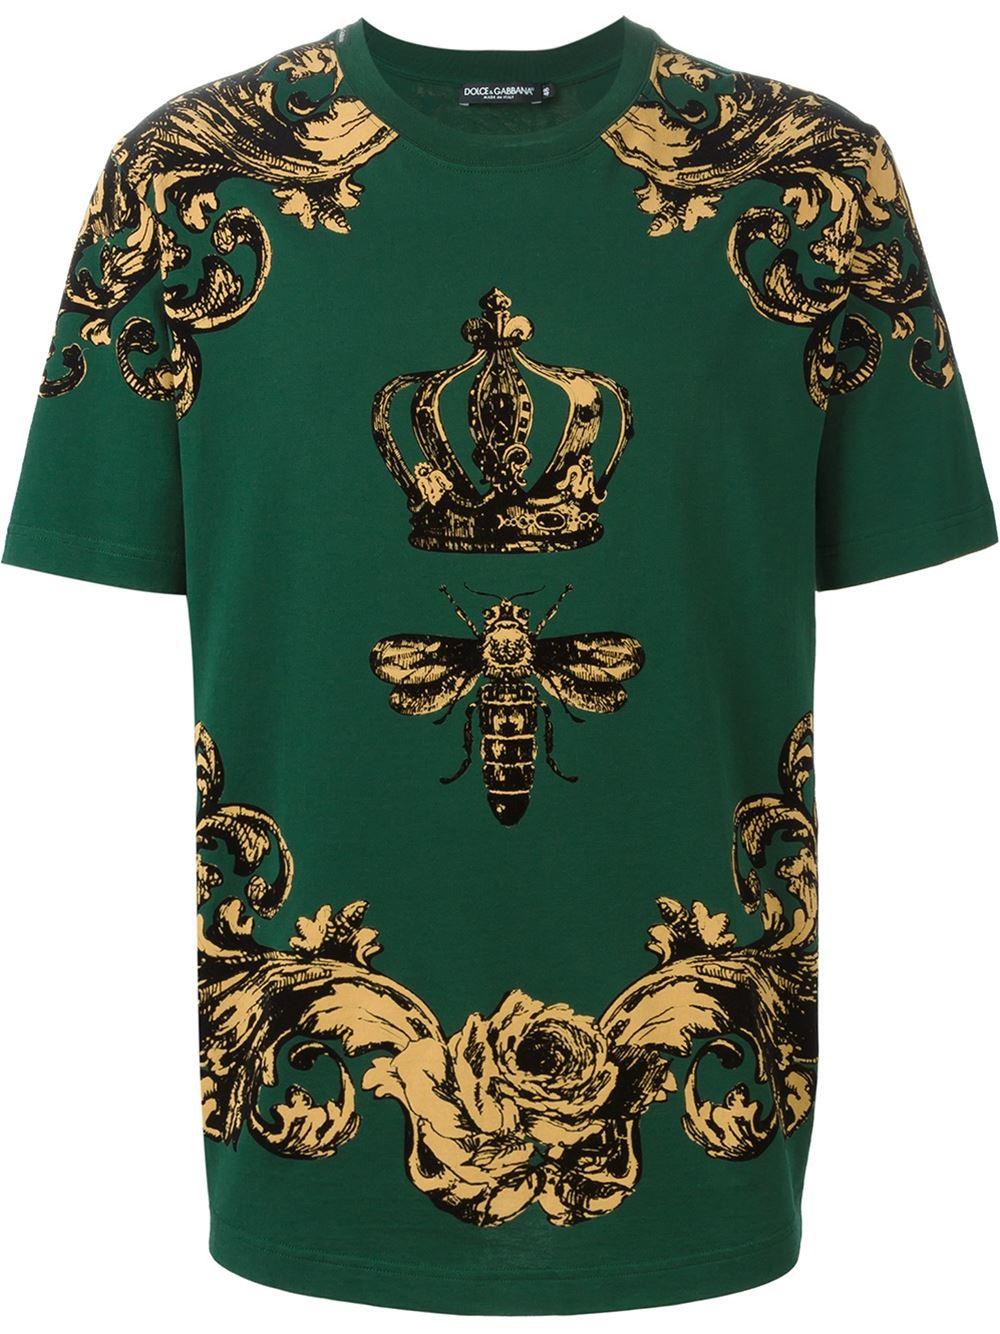 Dolce gabbana crown and bee print t shirt in yellow lyst for Dolce gabbana t shirt women